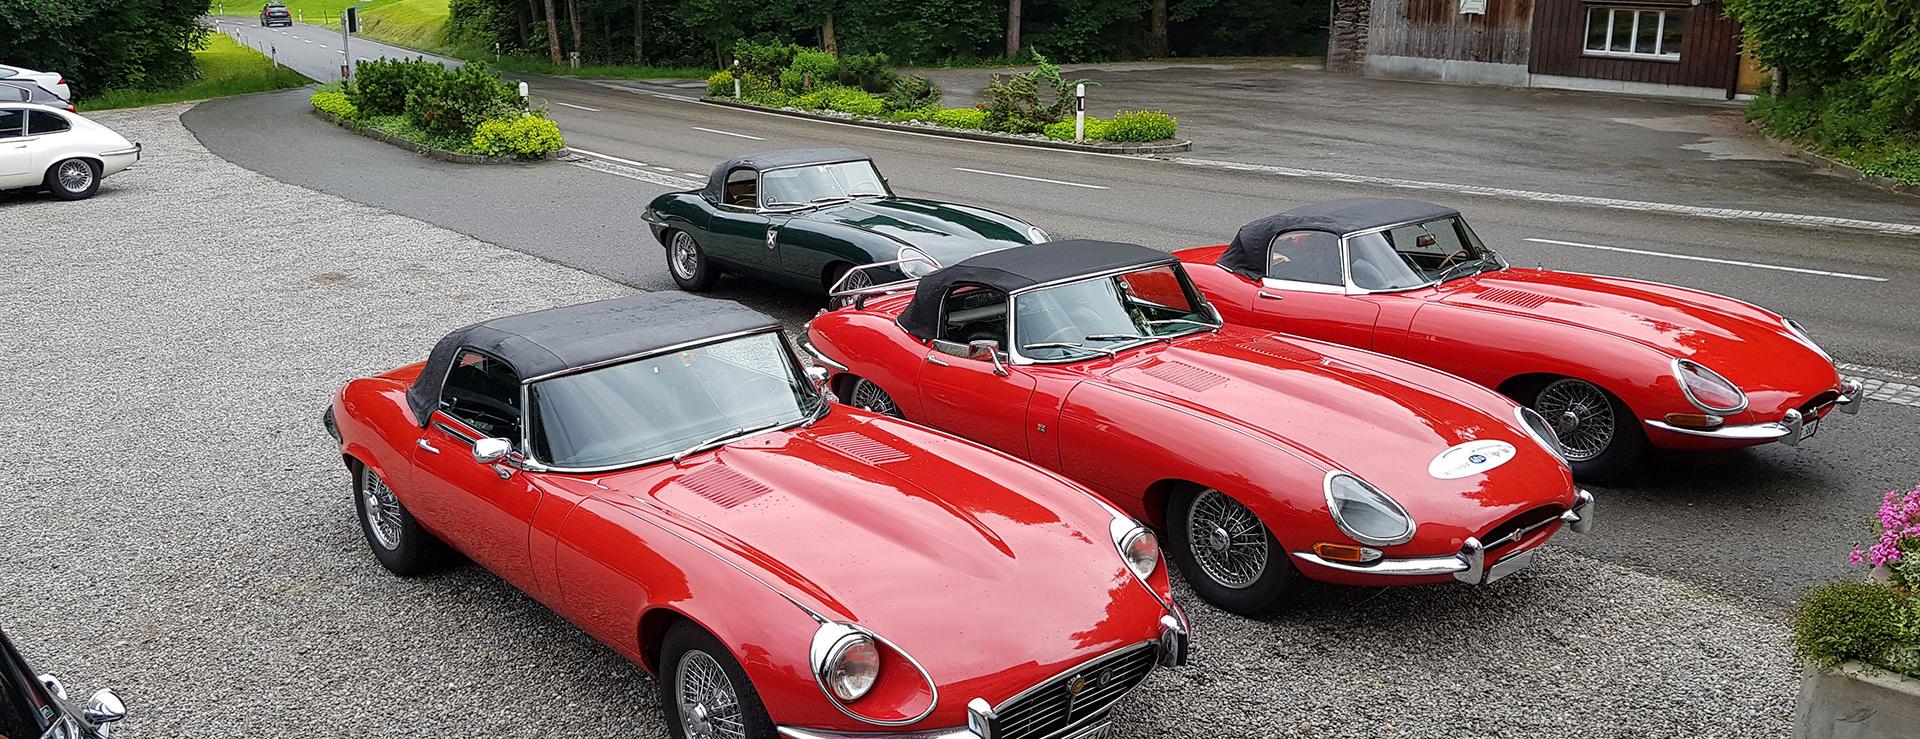 Swiss Jaguar E-Type Club, Jaguar E-Type Club Schweiz, Ausfahrt